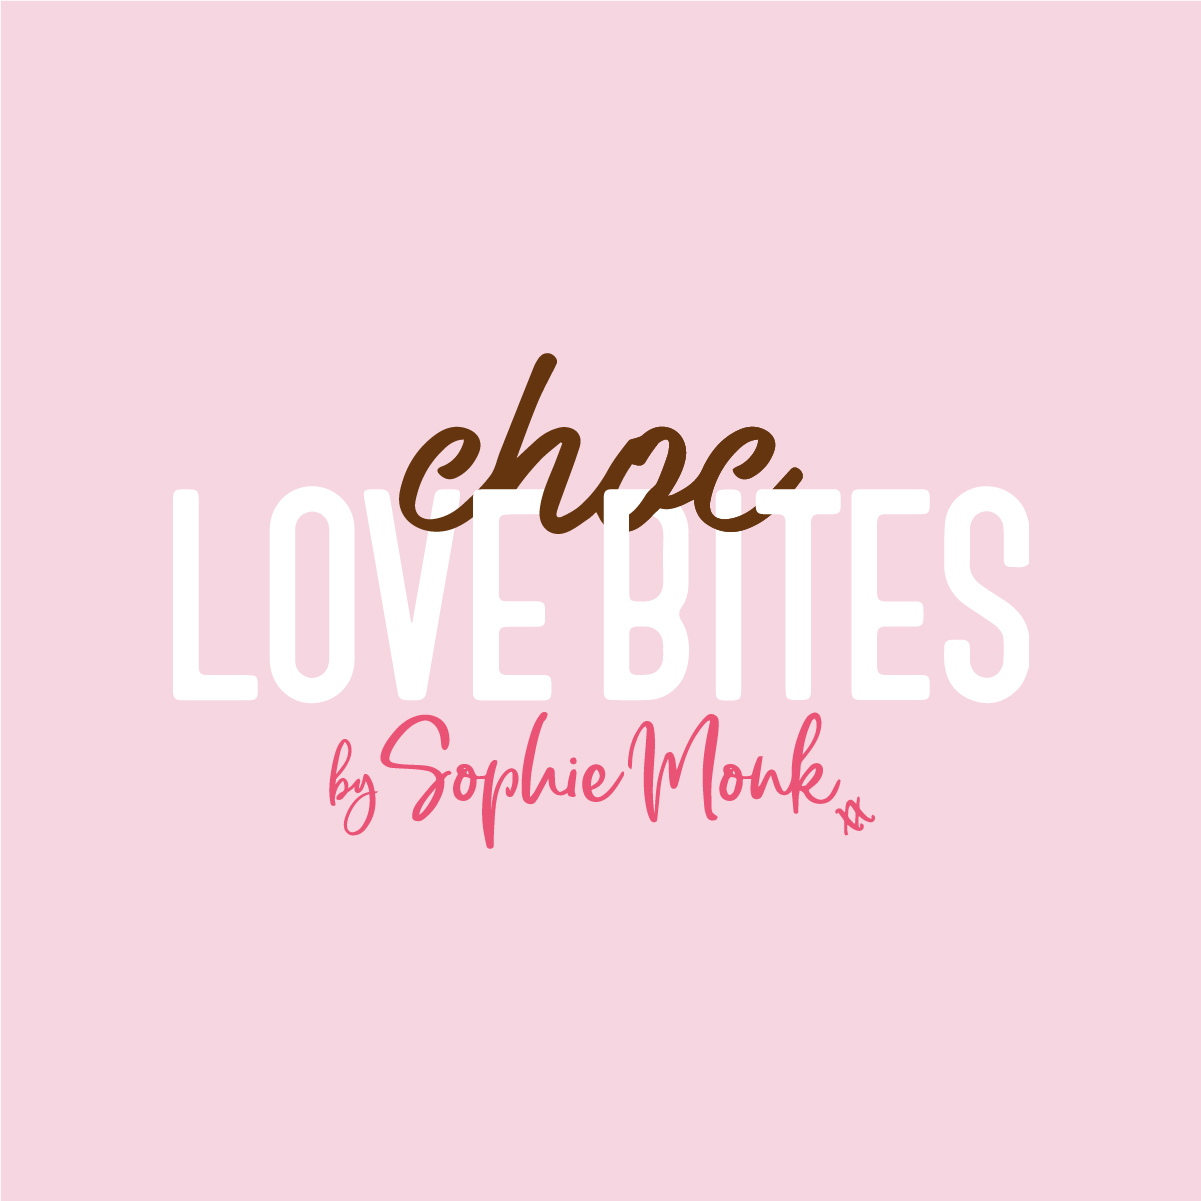 Choc Love Bites Slim Secrets Chocolate Chocolate Bites Sophie Monk Logo